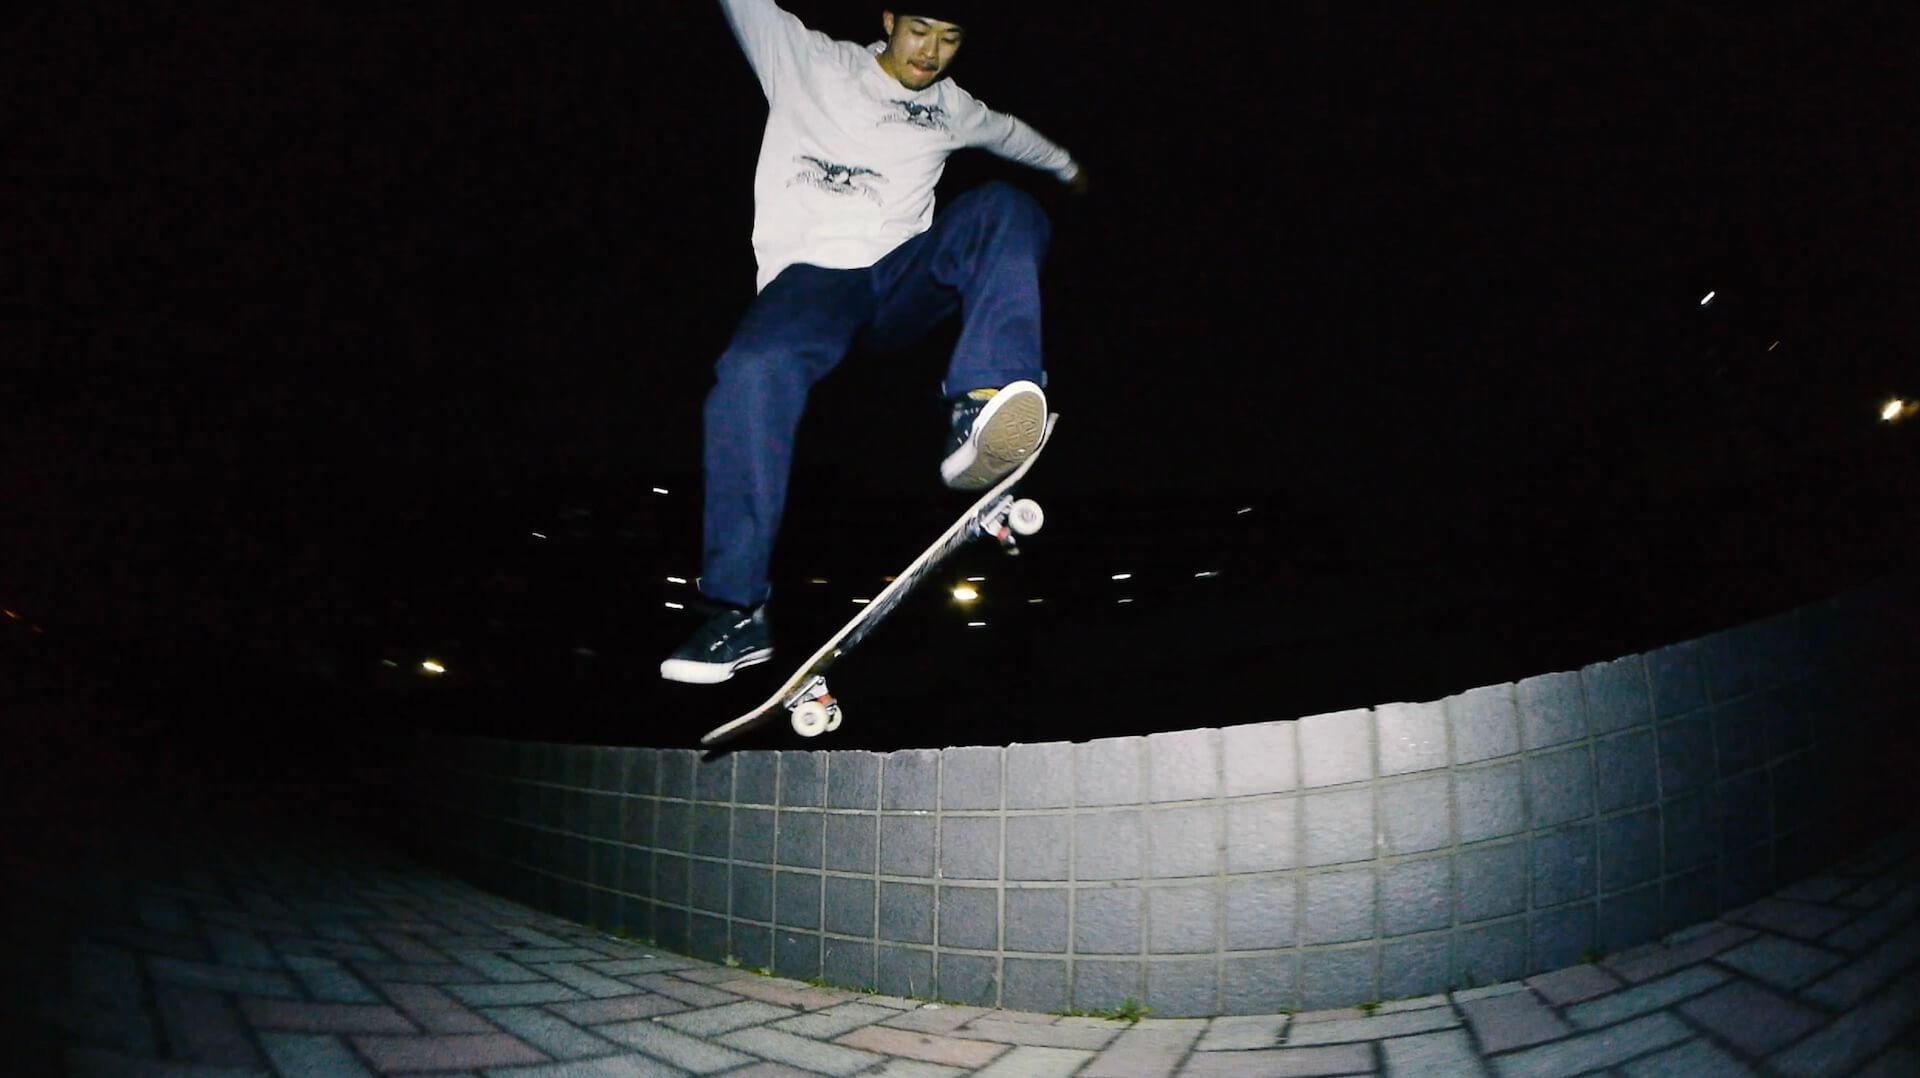 Diaspora skateboardsの新作ビデオ『SYMBIOSIS』の試写イベントにDaichi Yamamoto、tofubeatsが追加出演決定|アフターパーティーにAru-2、Kazuhiko Fujitaも music191226_diasporaskateboards_5